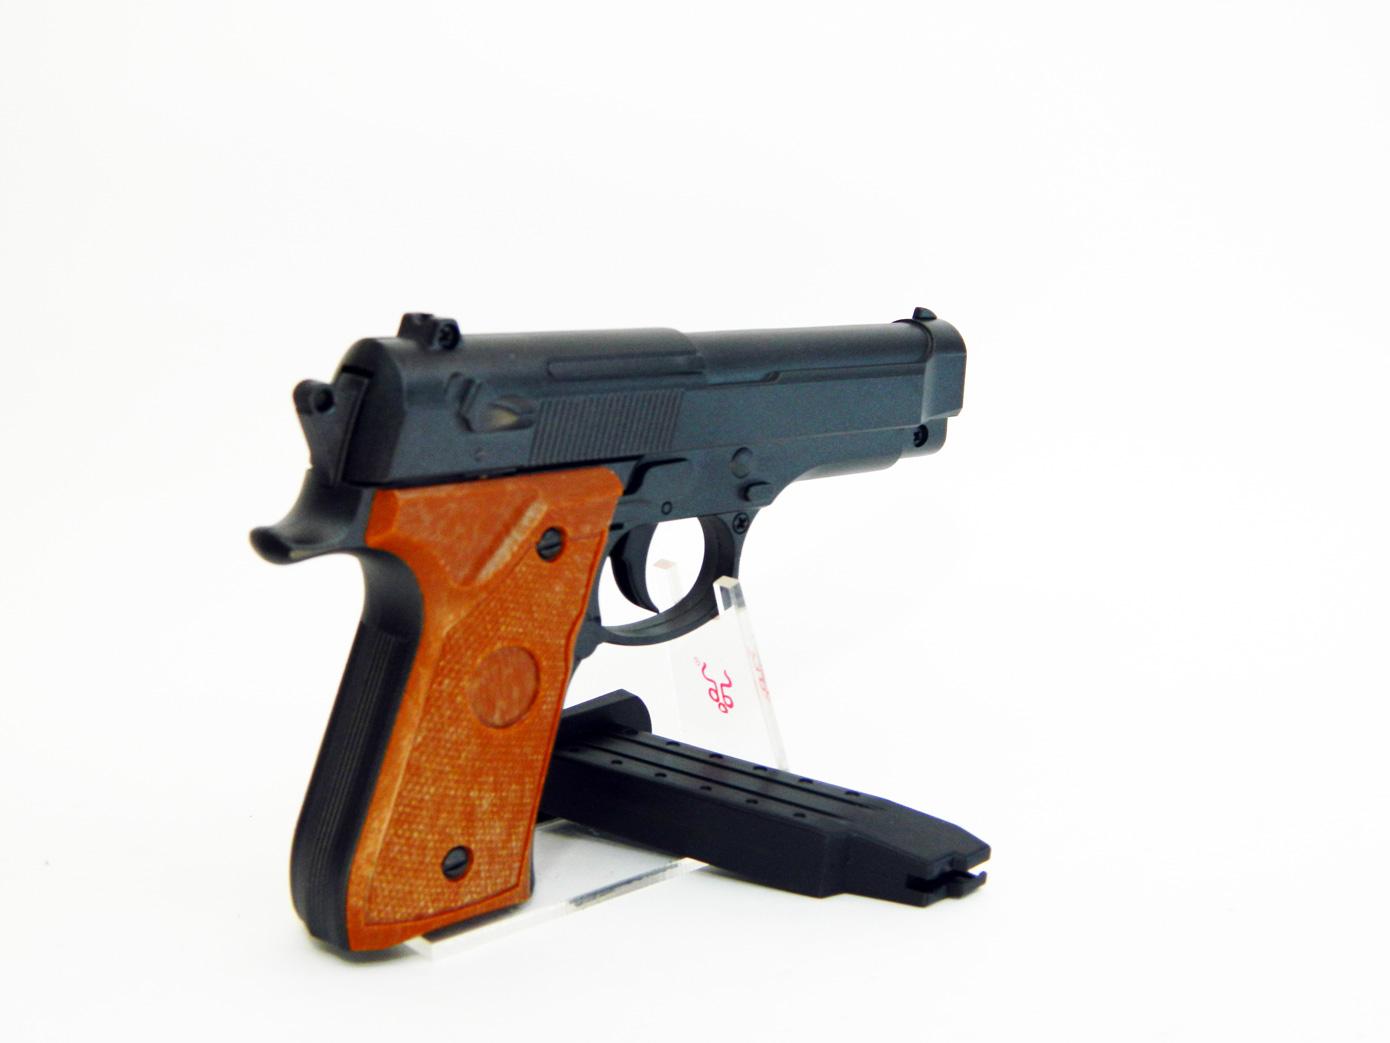 Beretta 92 mini масштаб 1:1 изображение 0